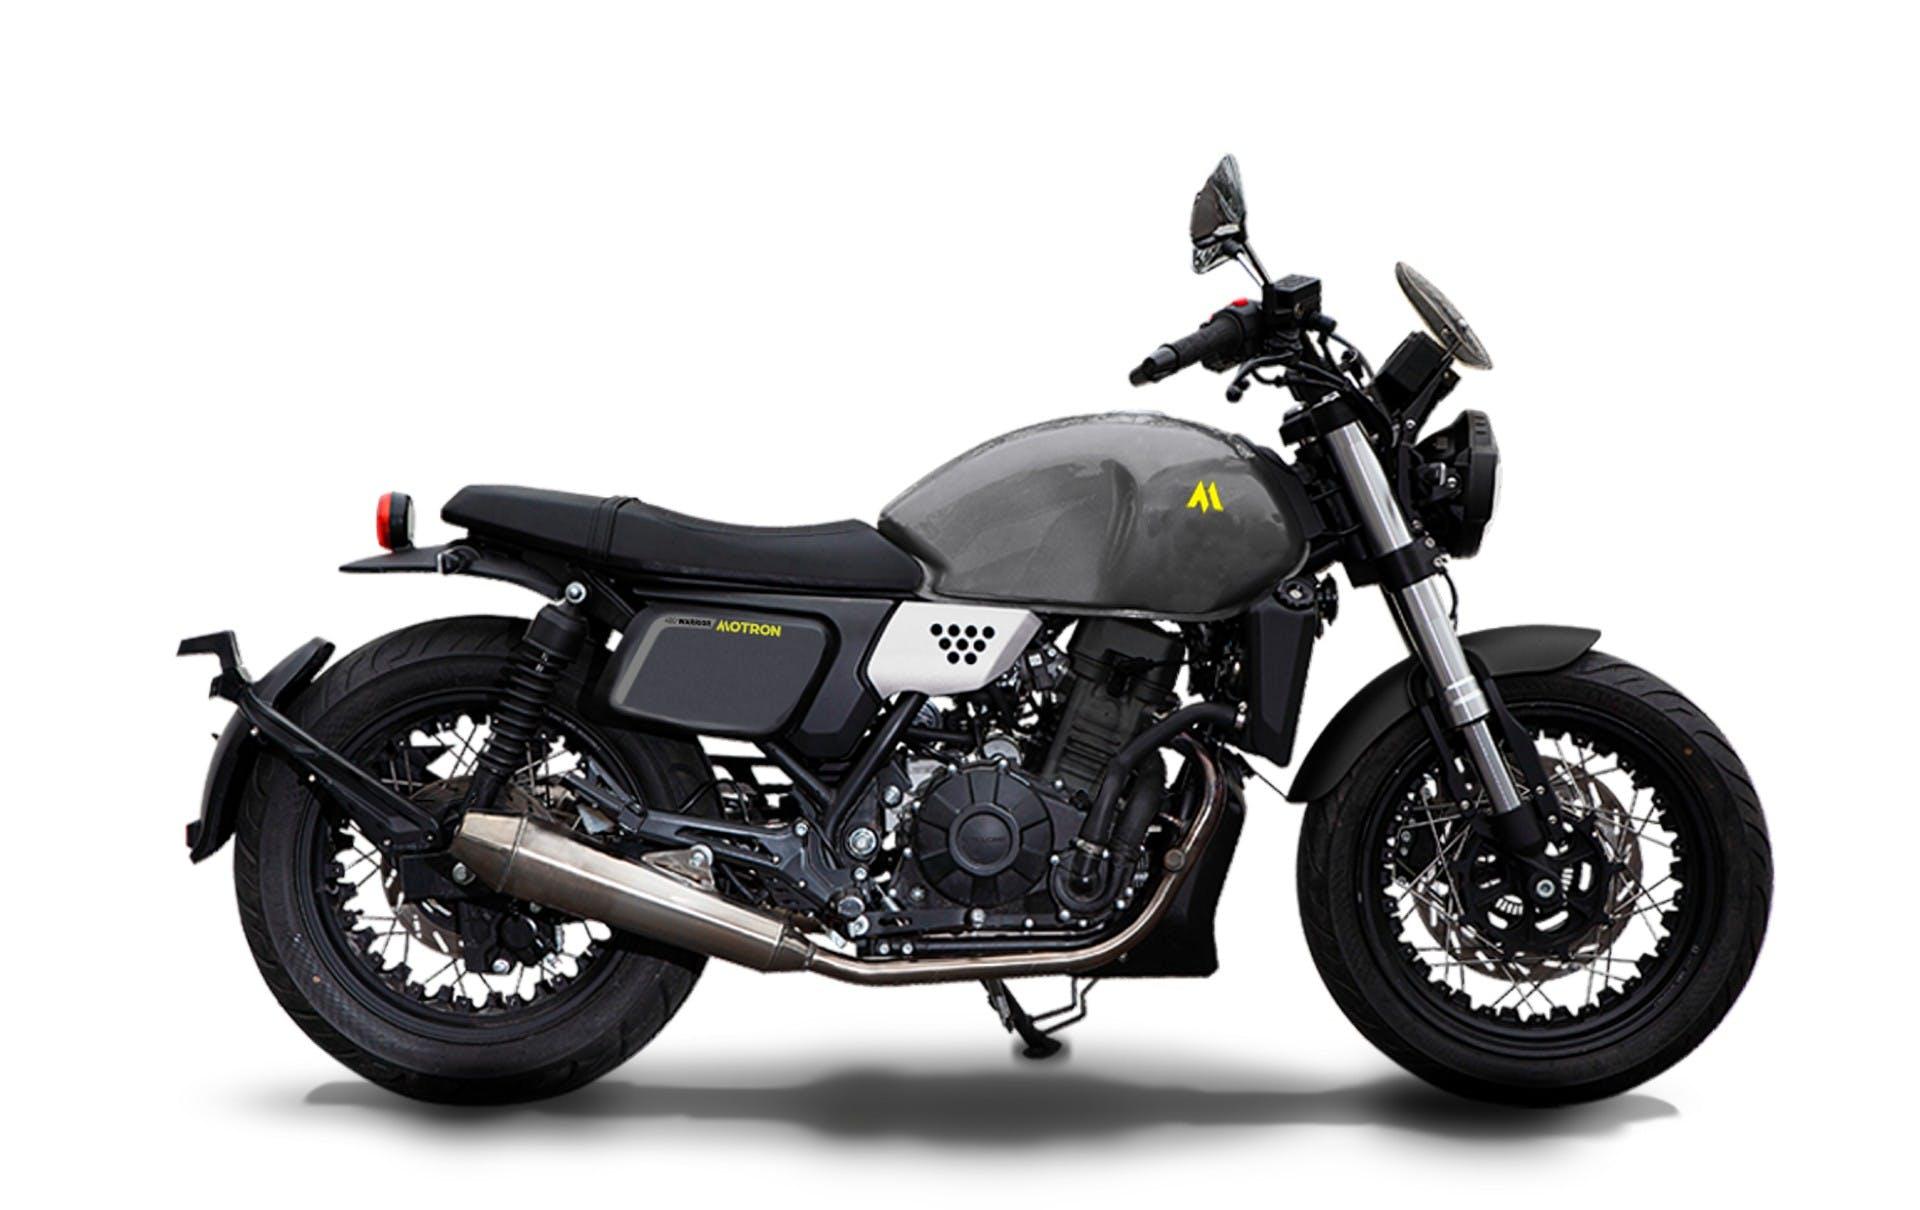 motron motorcycles moto warrior 400 grigia vista laterale in studio